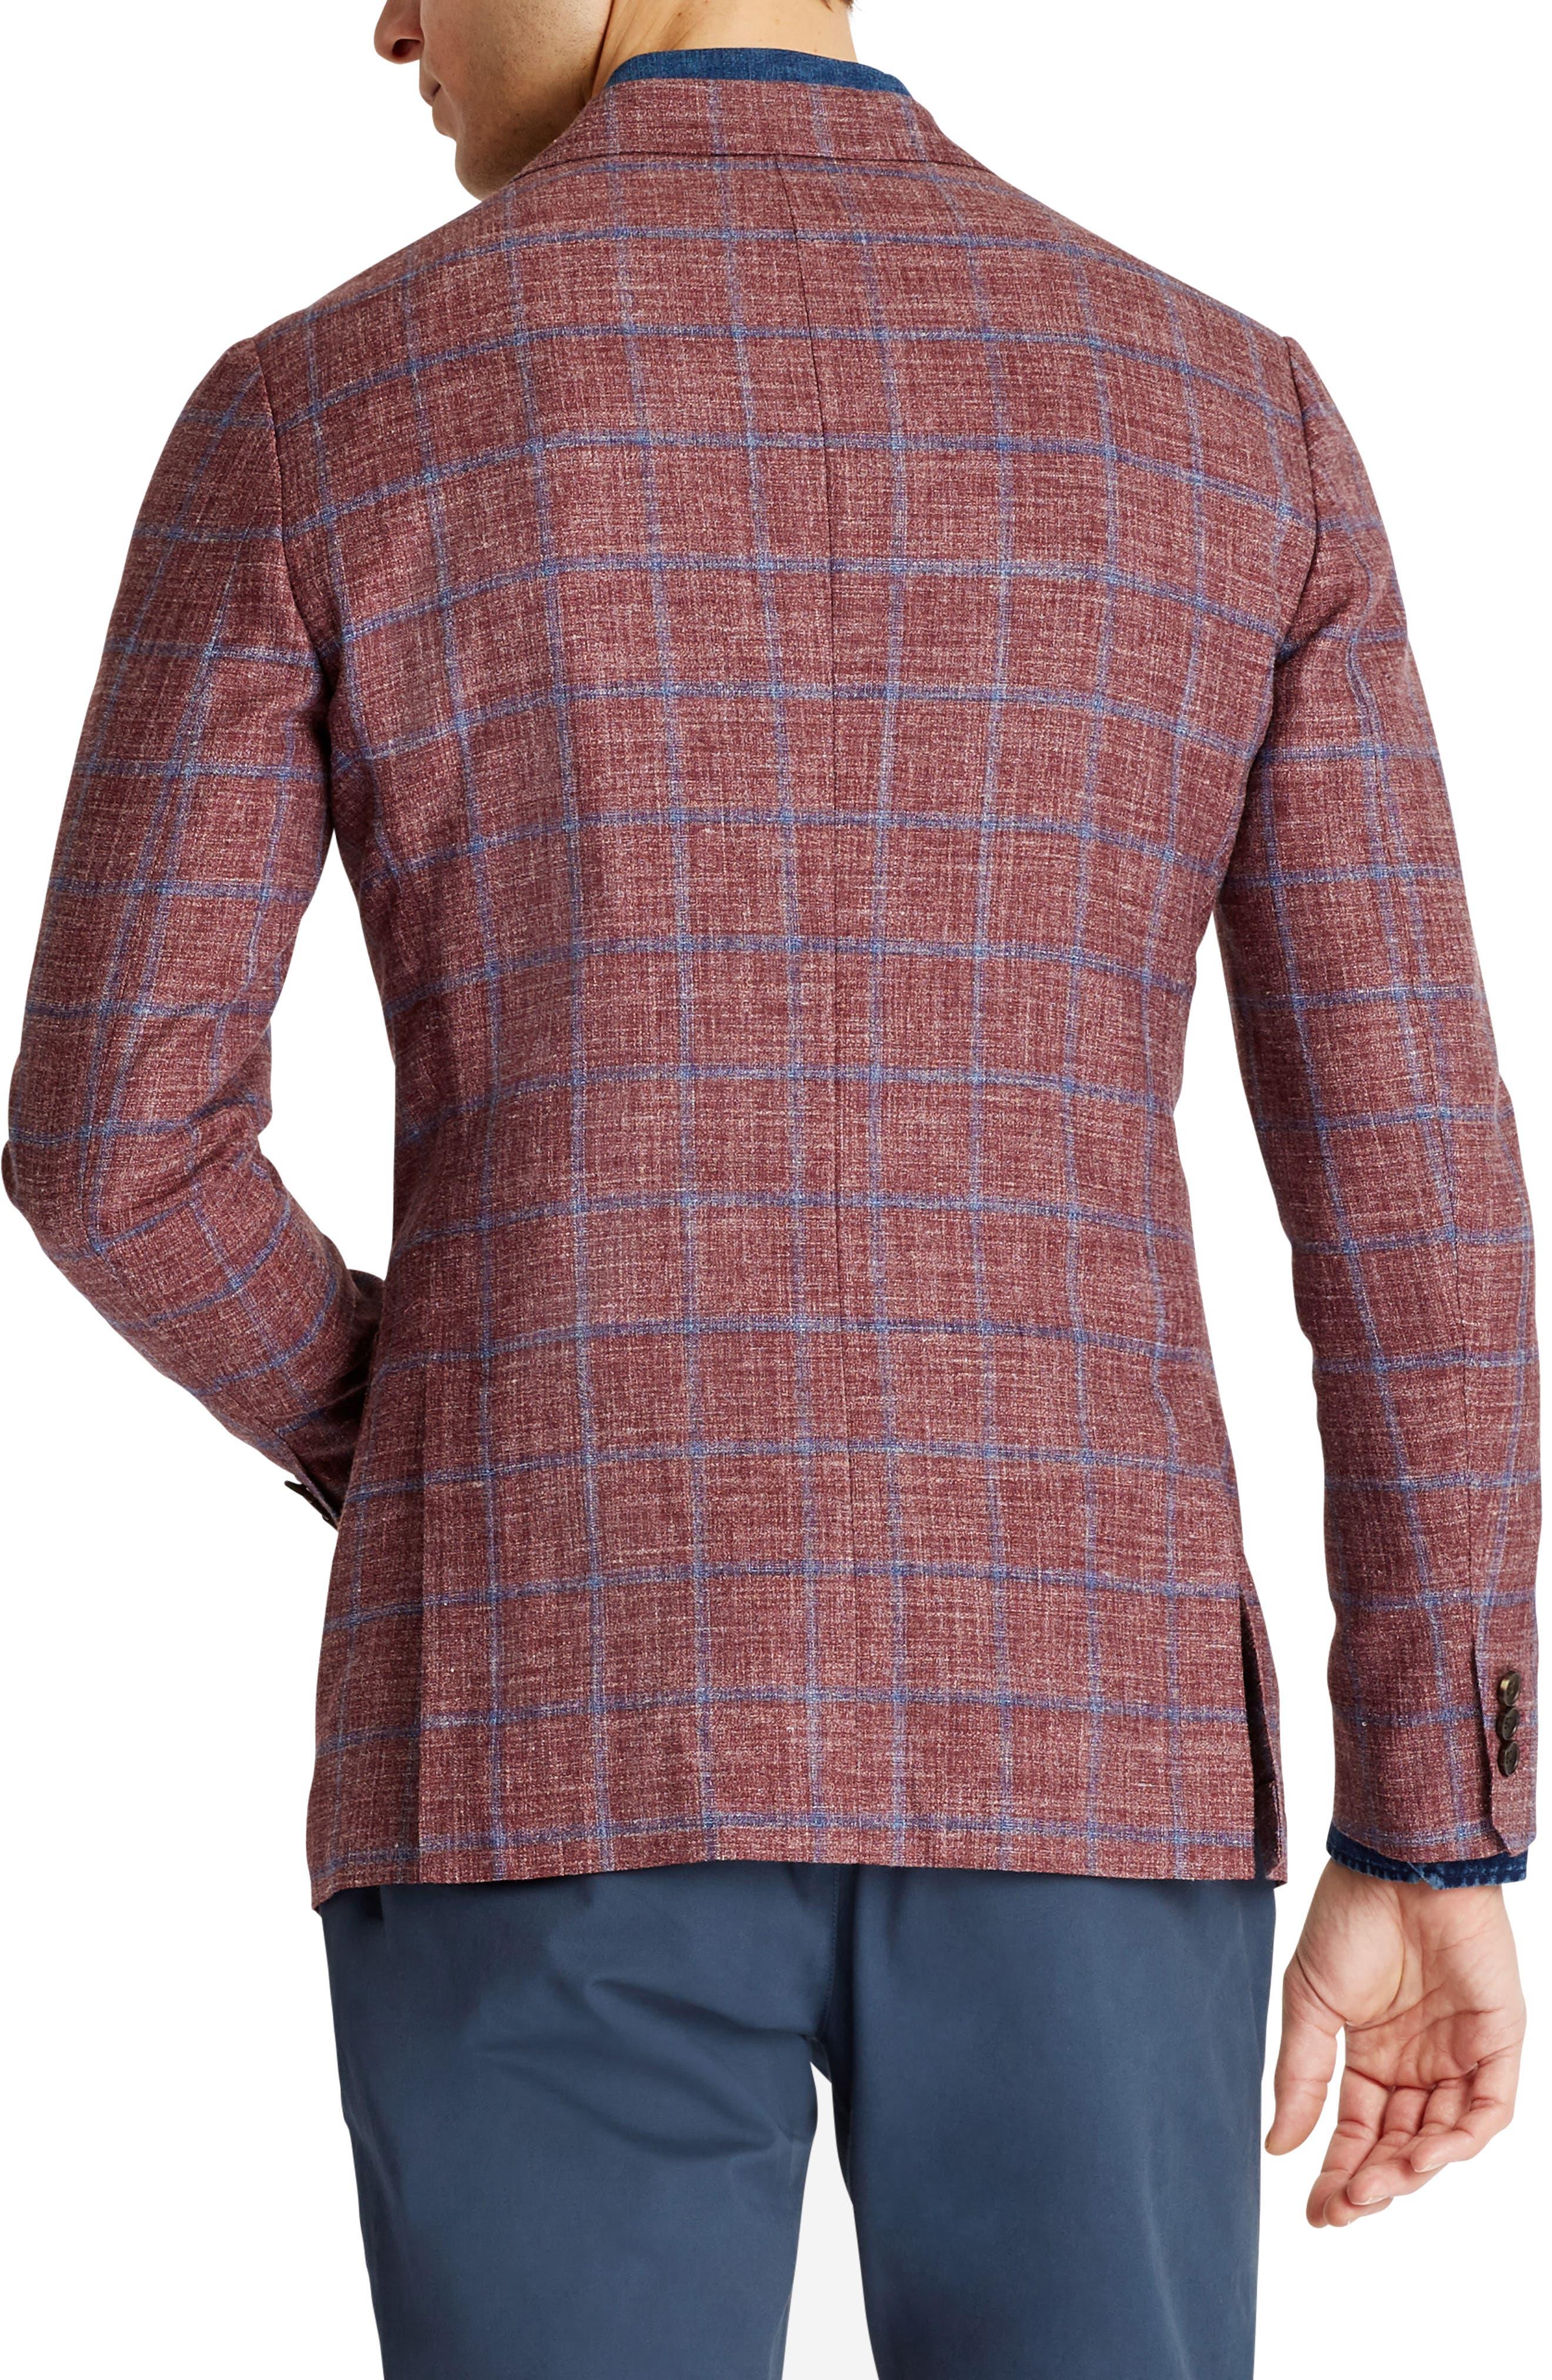 Capstone Slim Fit Windowpane Wool Blend Sport Coat,                             Alternate thumbnail 2, color,                             600